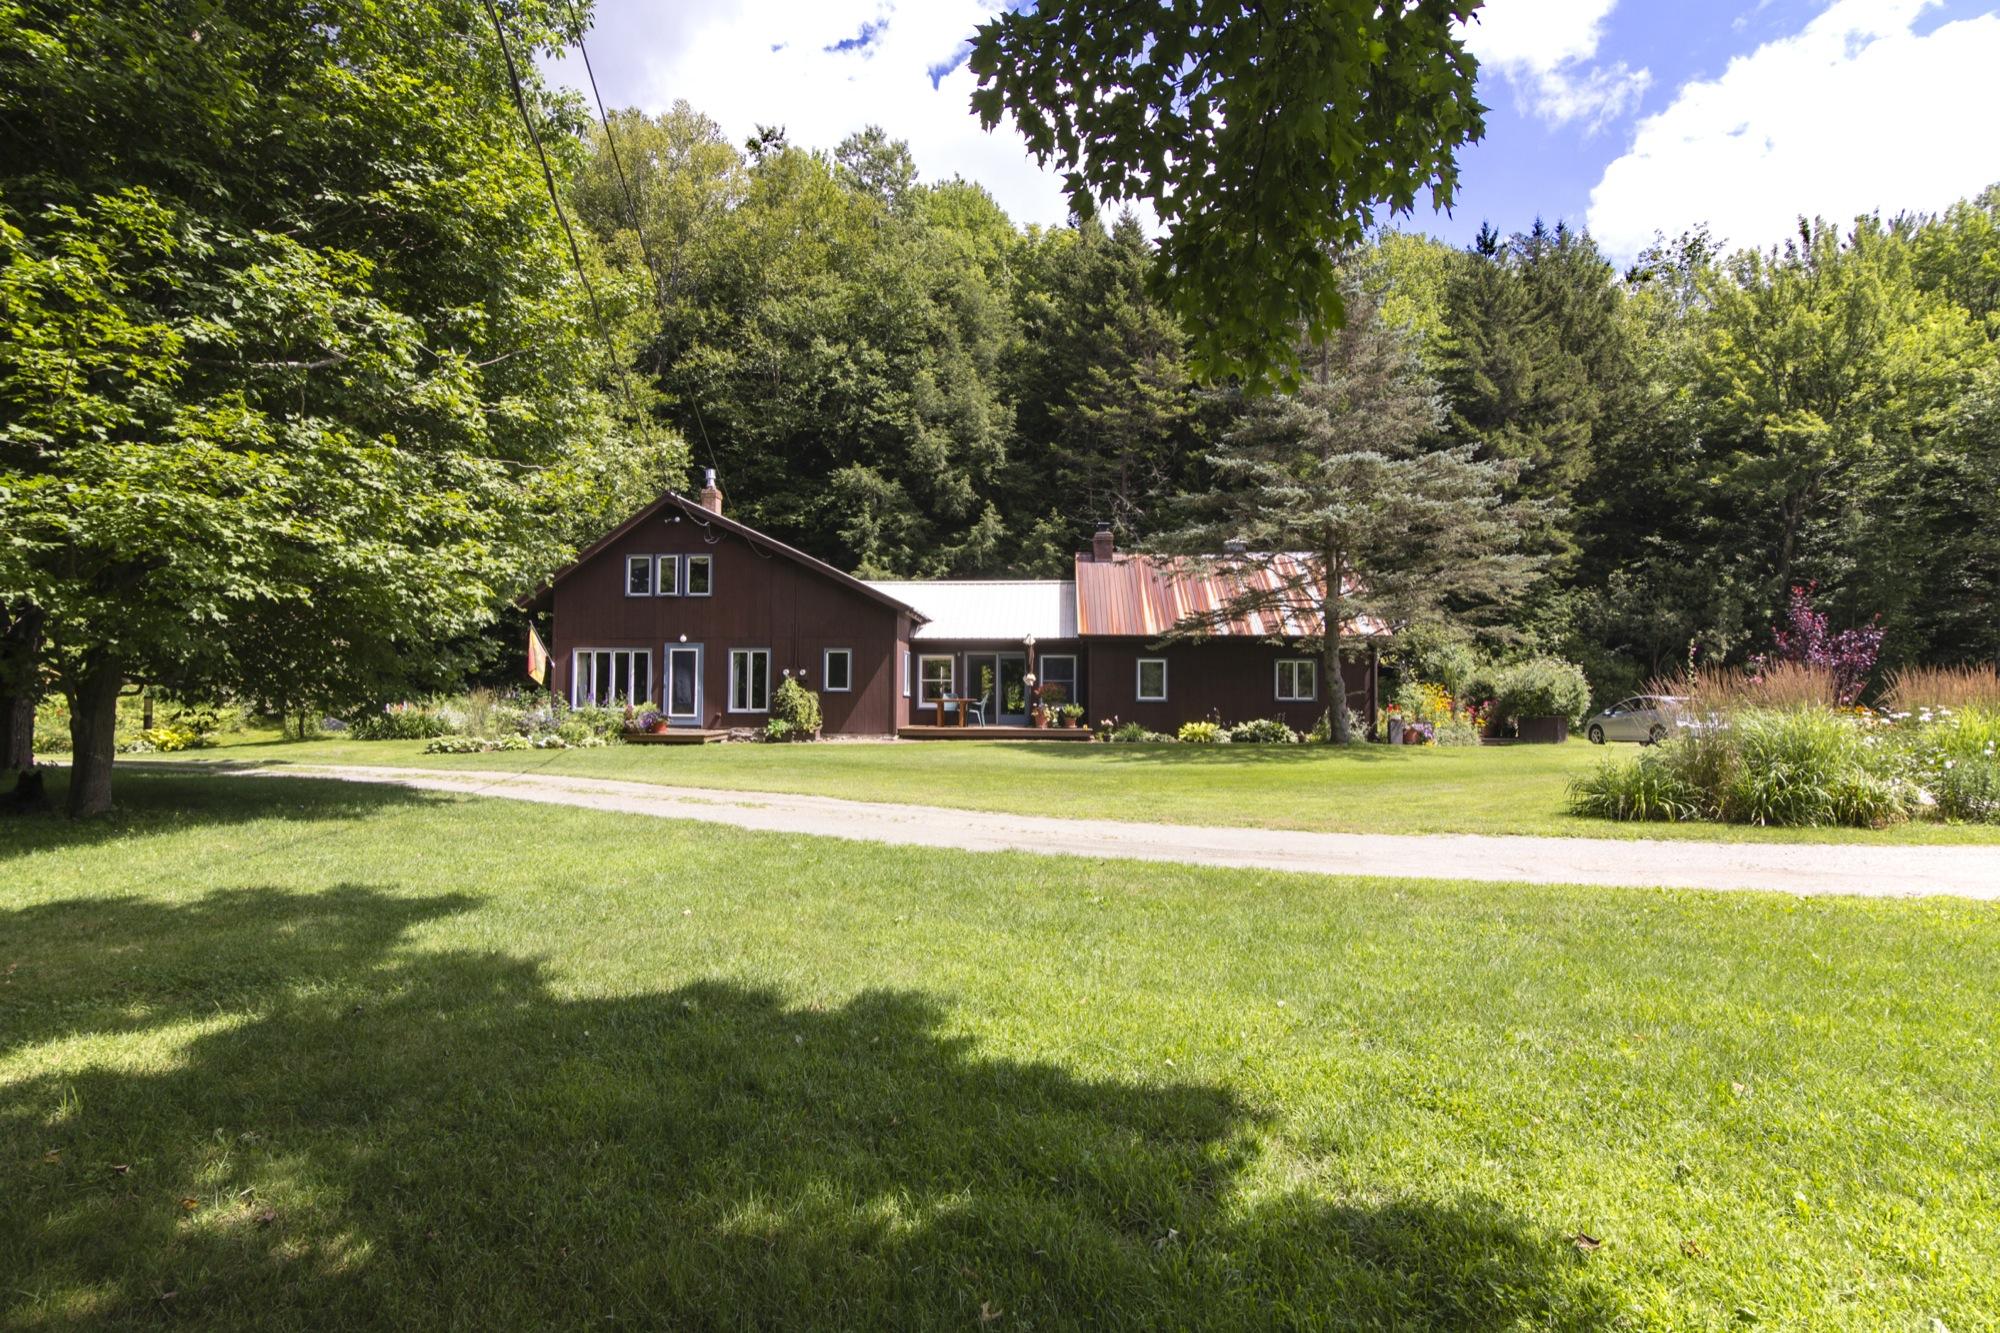 01-IMG_0541 20130730 Lipke Vigesaa House MAIN.jpg